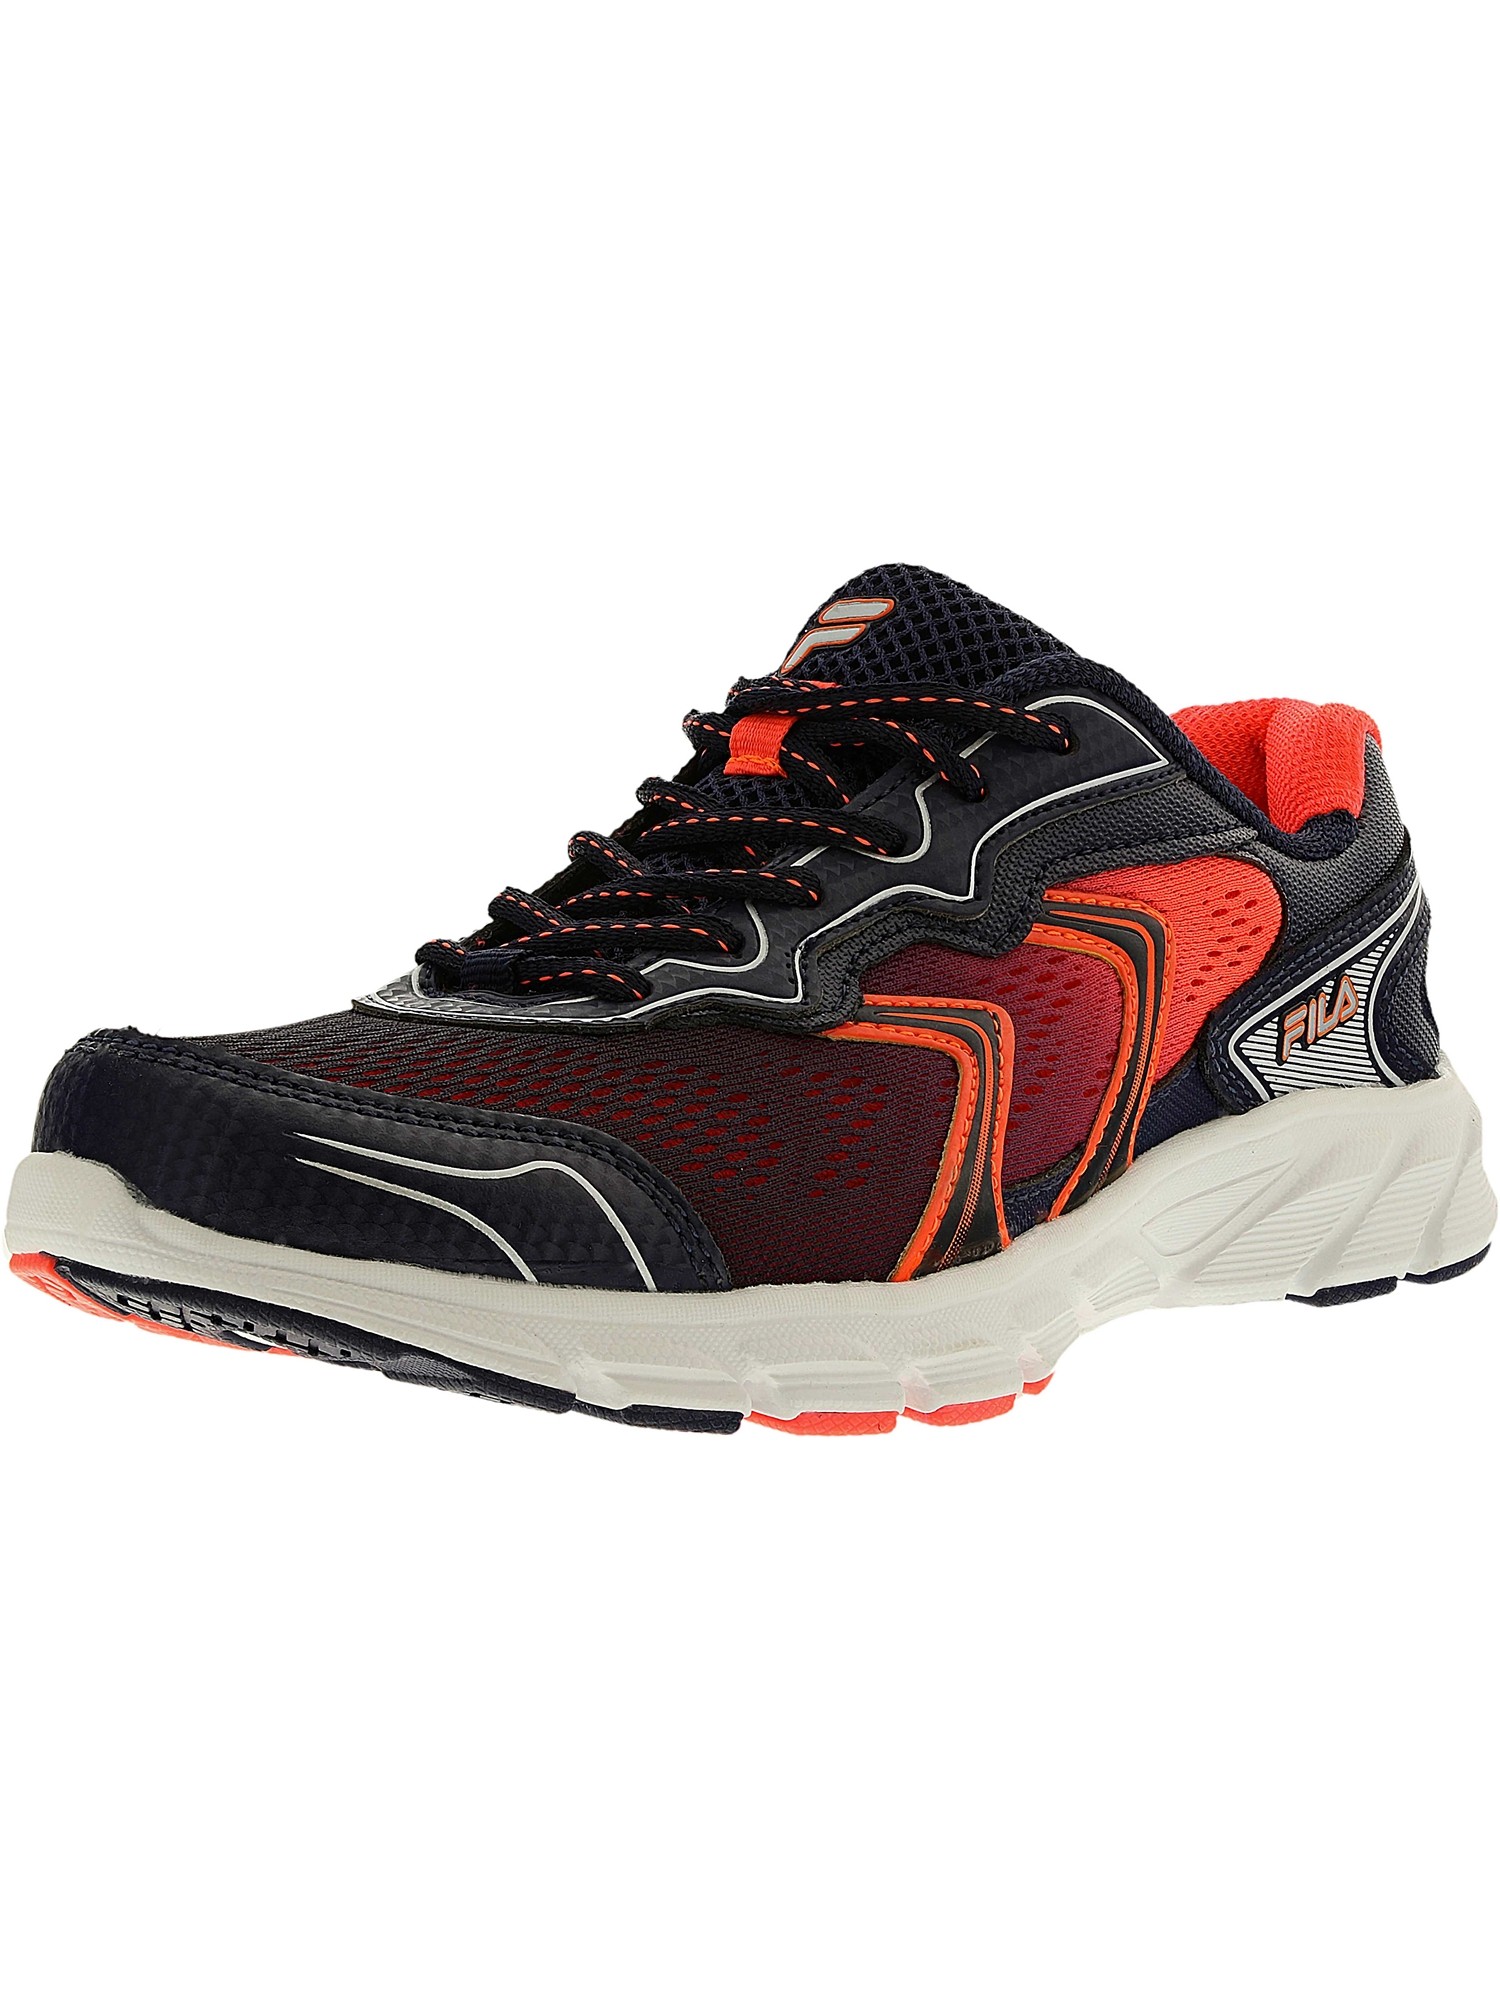 Fila Fila Women's Stellaray NavyFiery CoralWhite Ankle High Running Shoe 7.5M